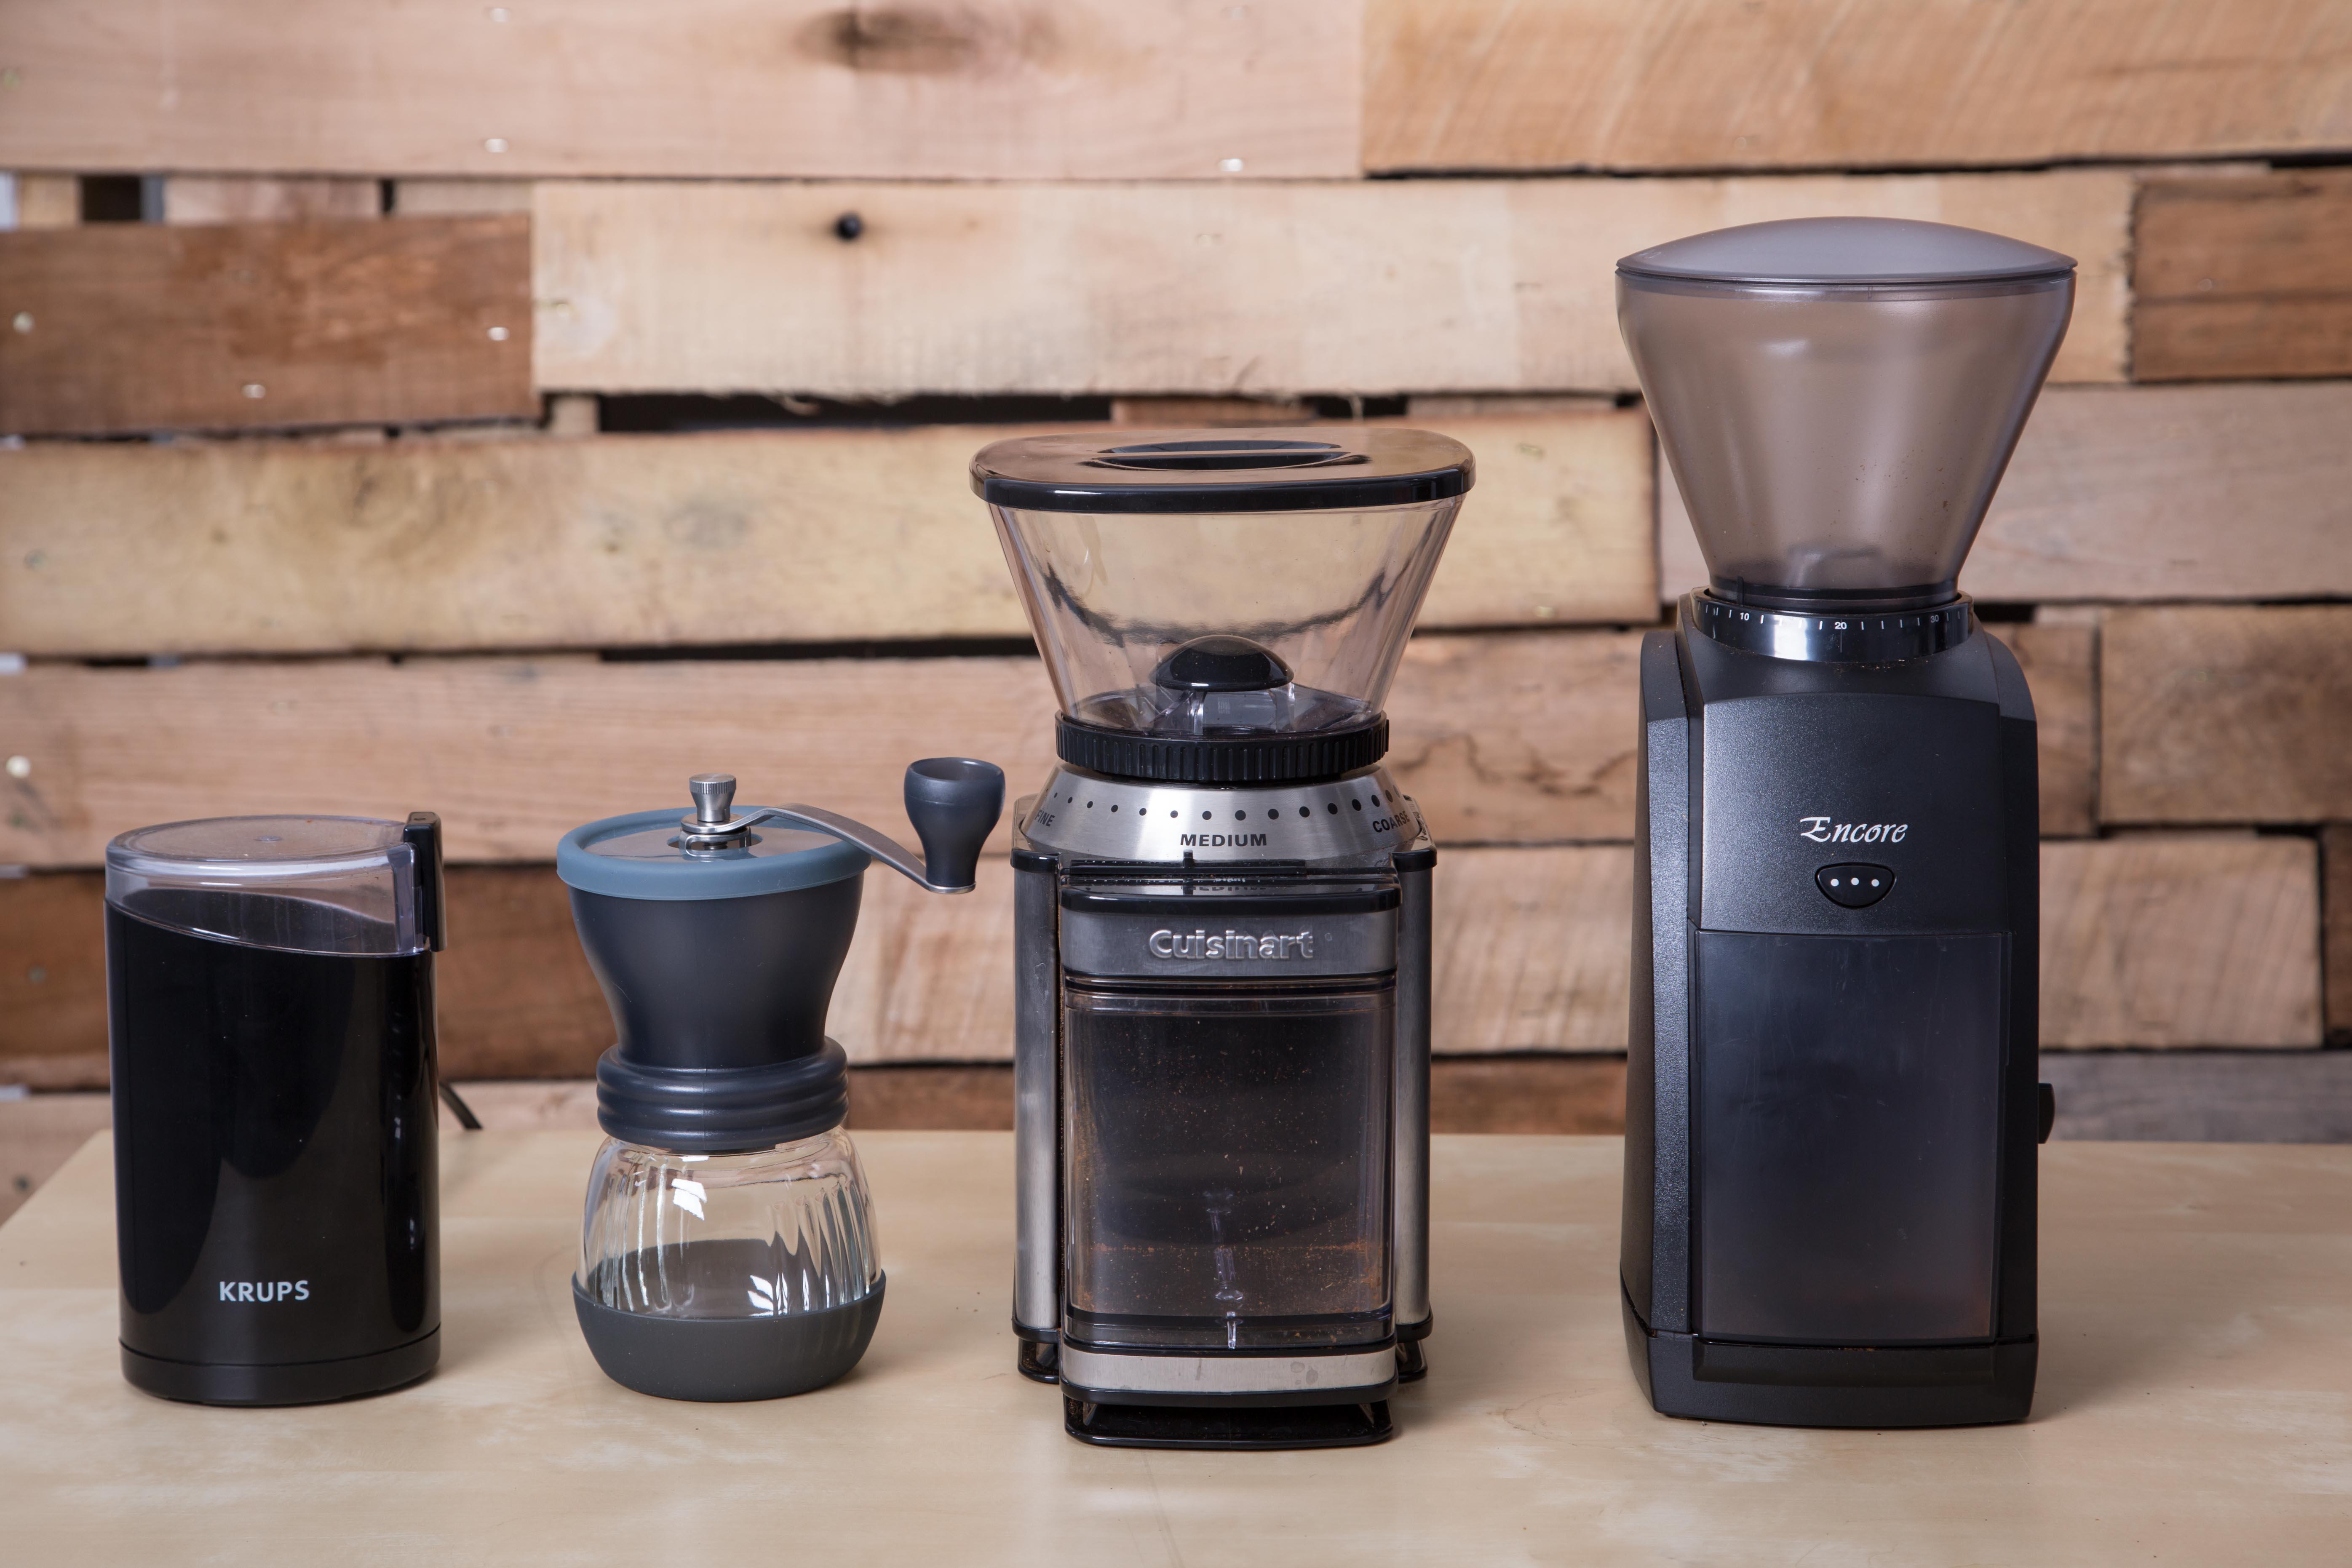 Home grinder lineup: Krups Blade Grinder, Hario Skerton, Cuisinart DBM-8, Baratza Encore.